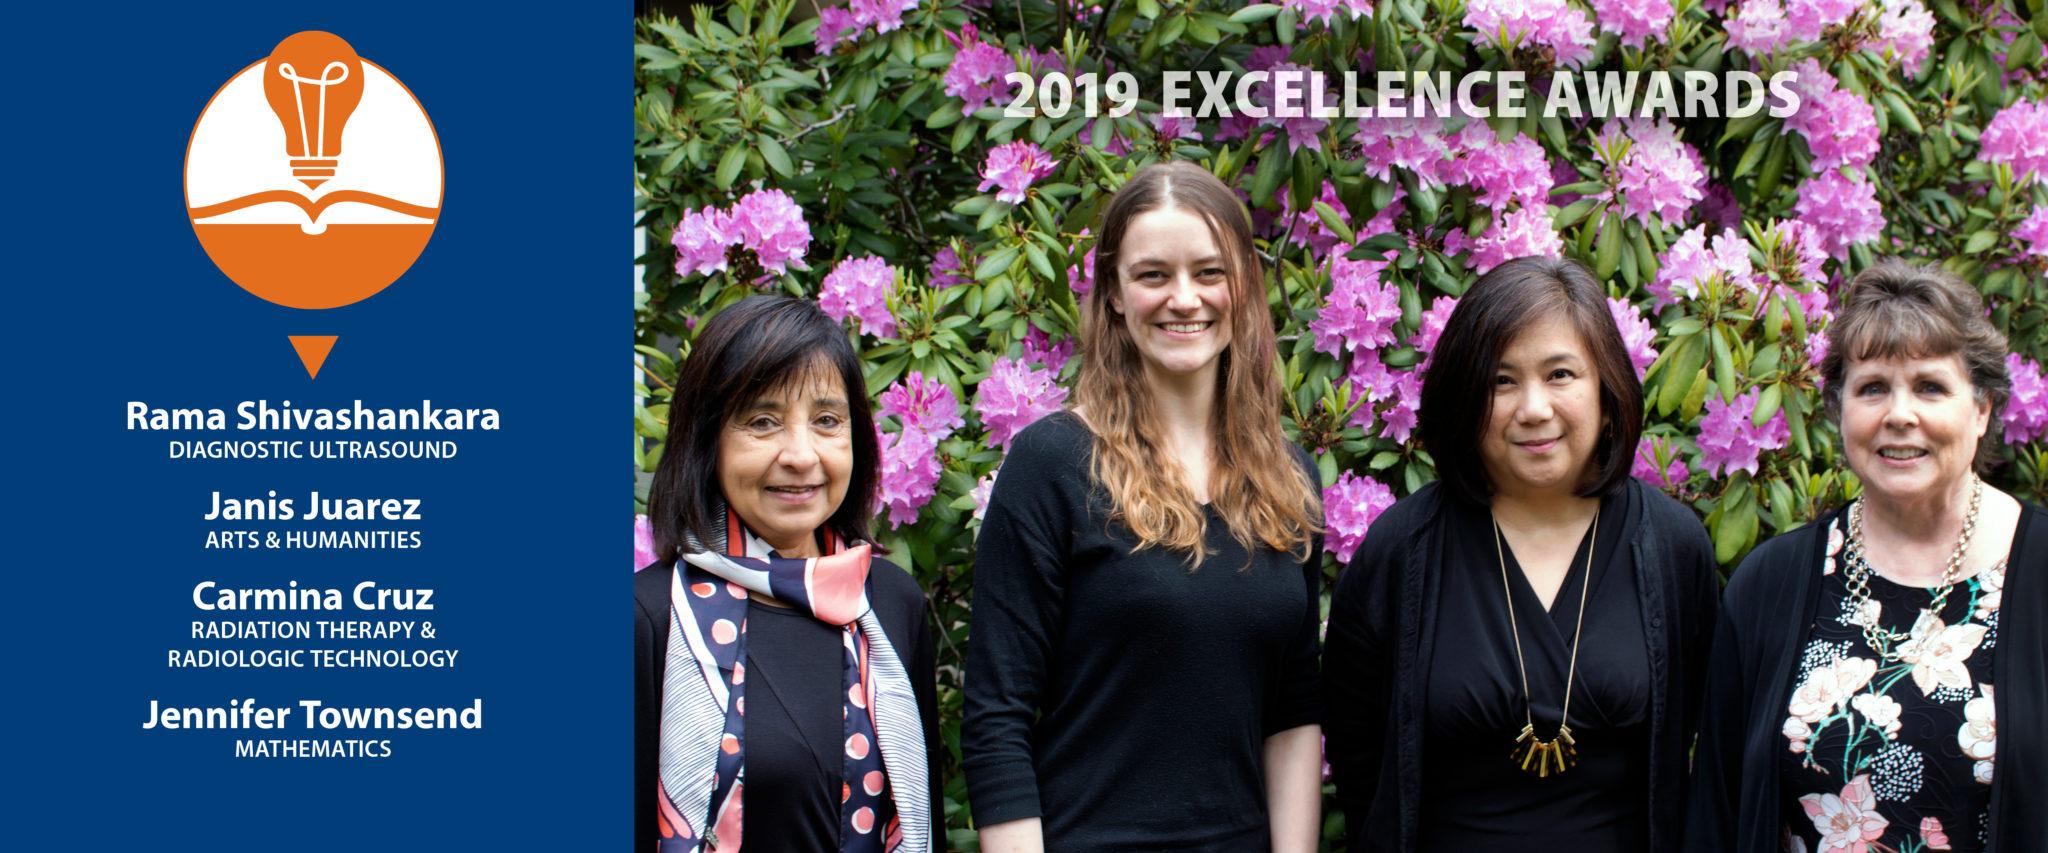 2018-19 winners of BC Excellence Awards. (L to R) Rama Shivashankara, Jen Townsend, Carmina Cruz, Janis Juarez